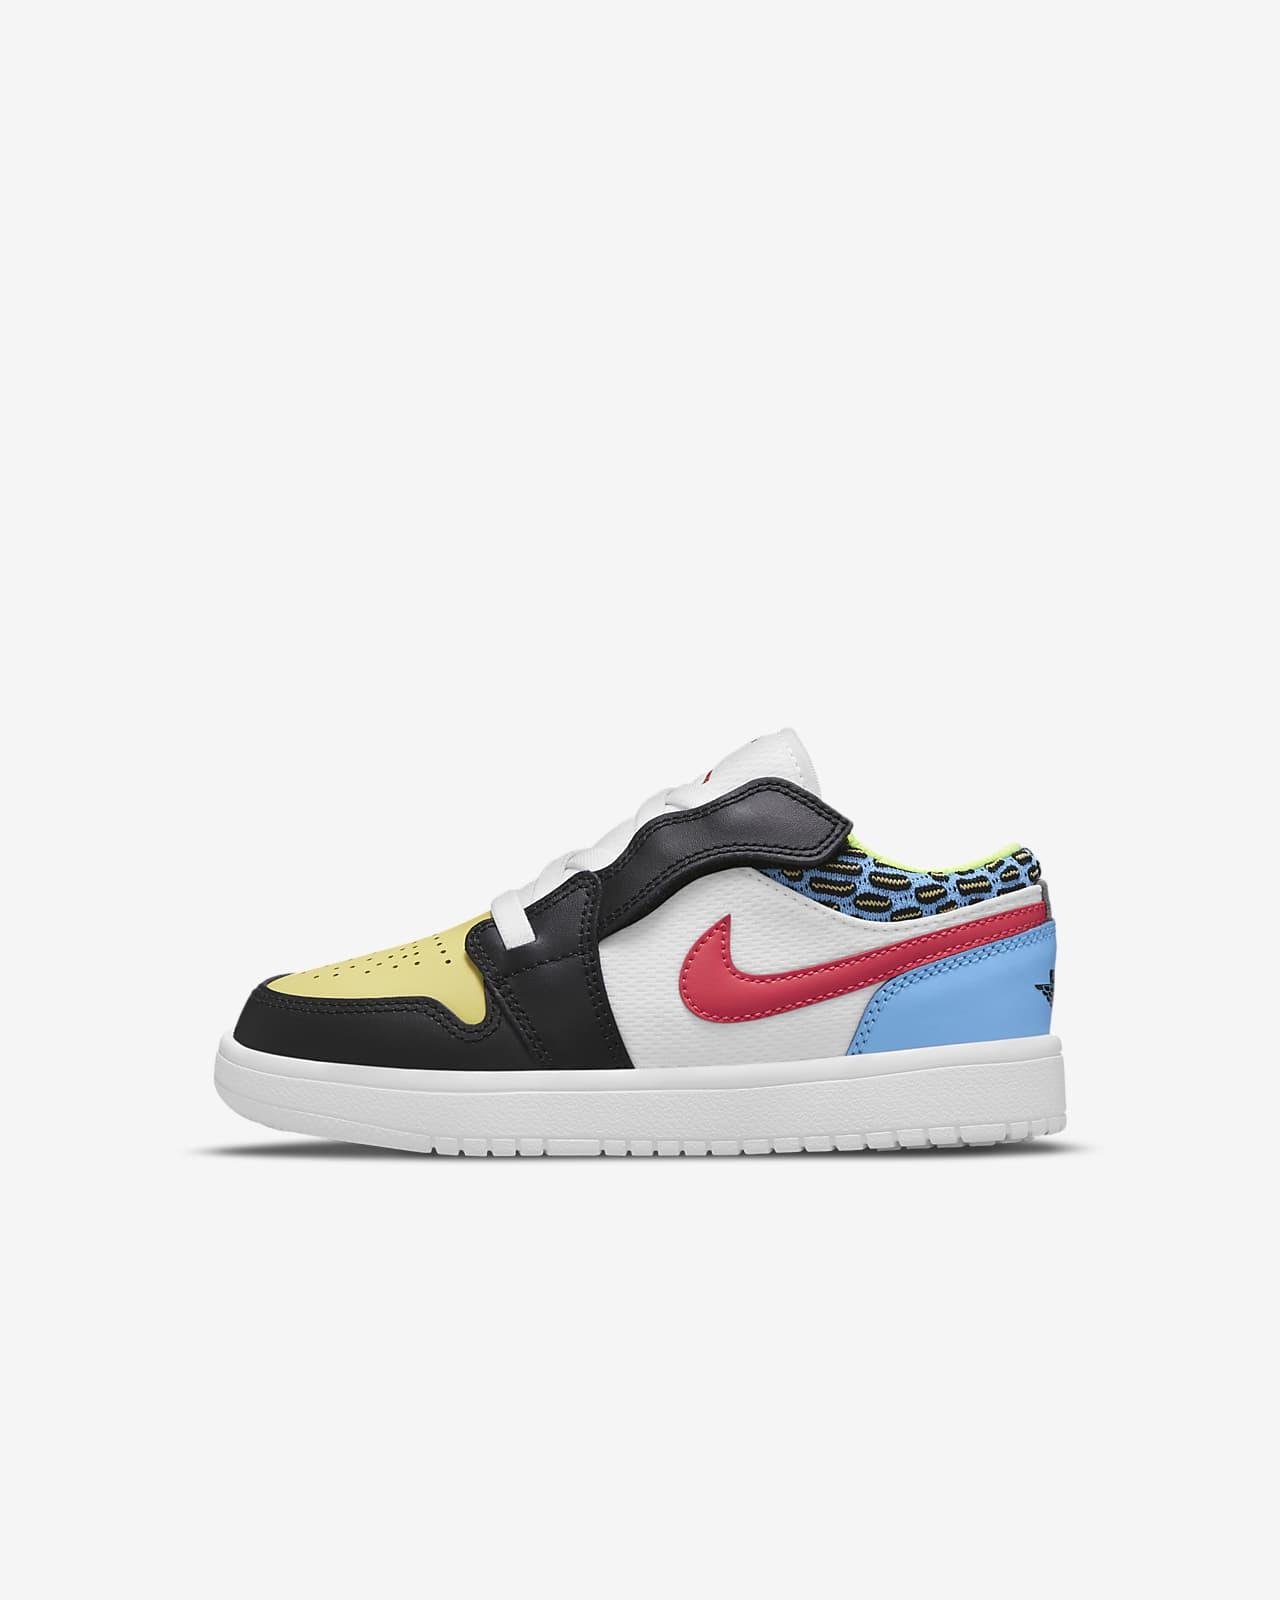 Jordan 1 Low Younger Kids' Shoe